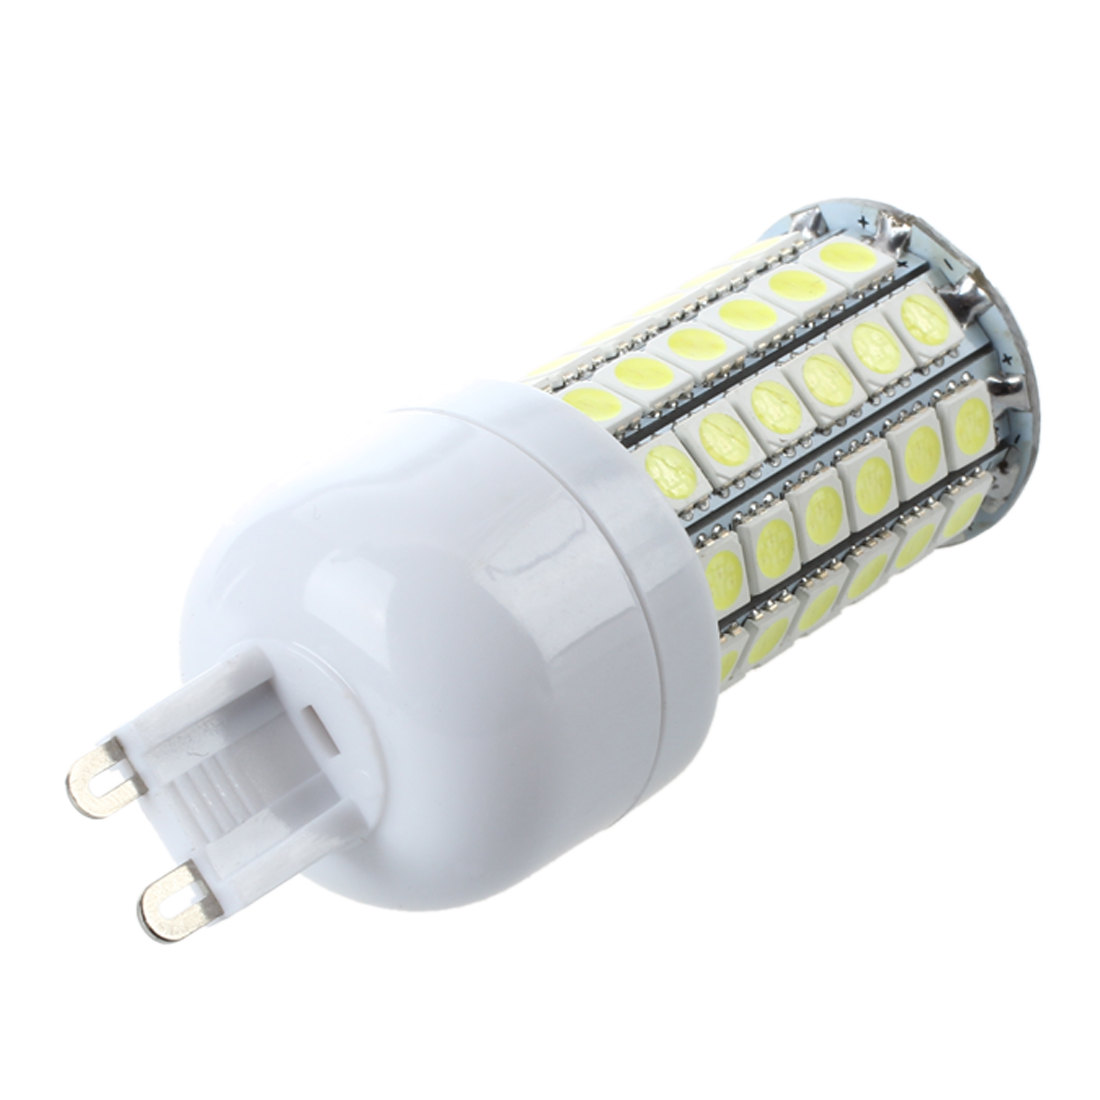 Lights & Lighting 5x G9 8w 69 Led 5050 Smd Beleuchtung Lampe Leuchtmittel Leuchte Birne 500lm Wei